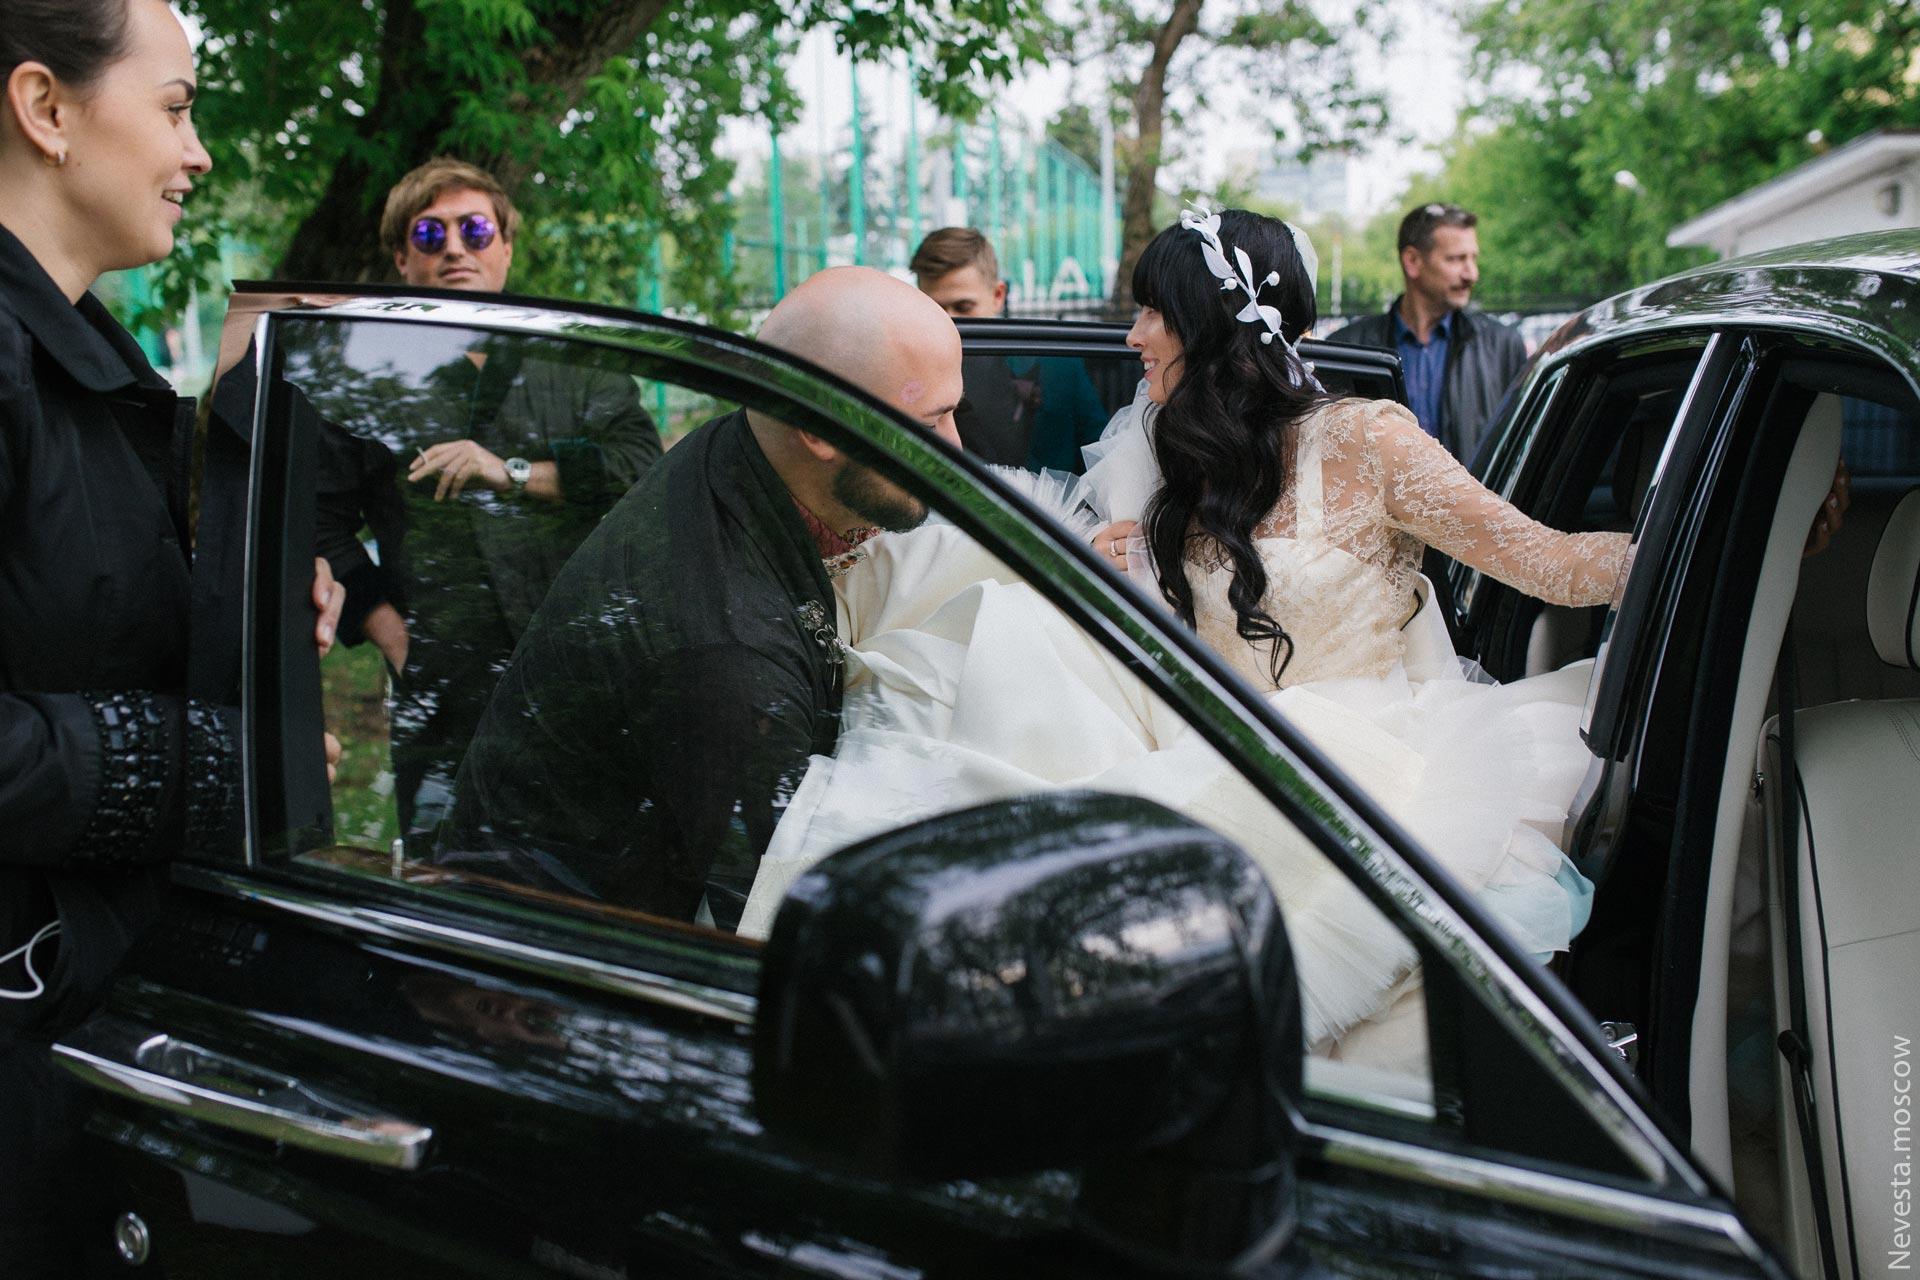 Свадьба Нелли Ермолаевой и Кирилла Андреева фото 24